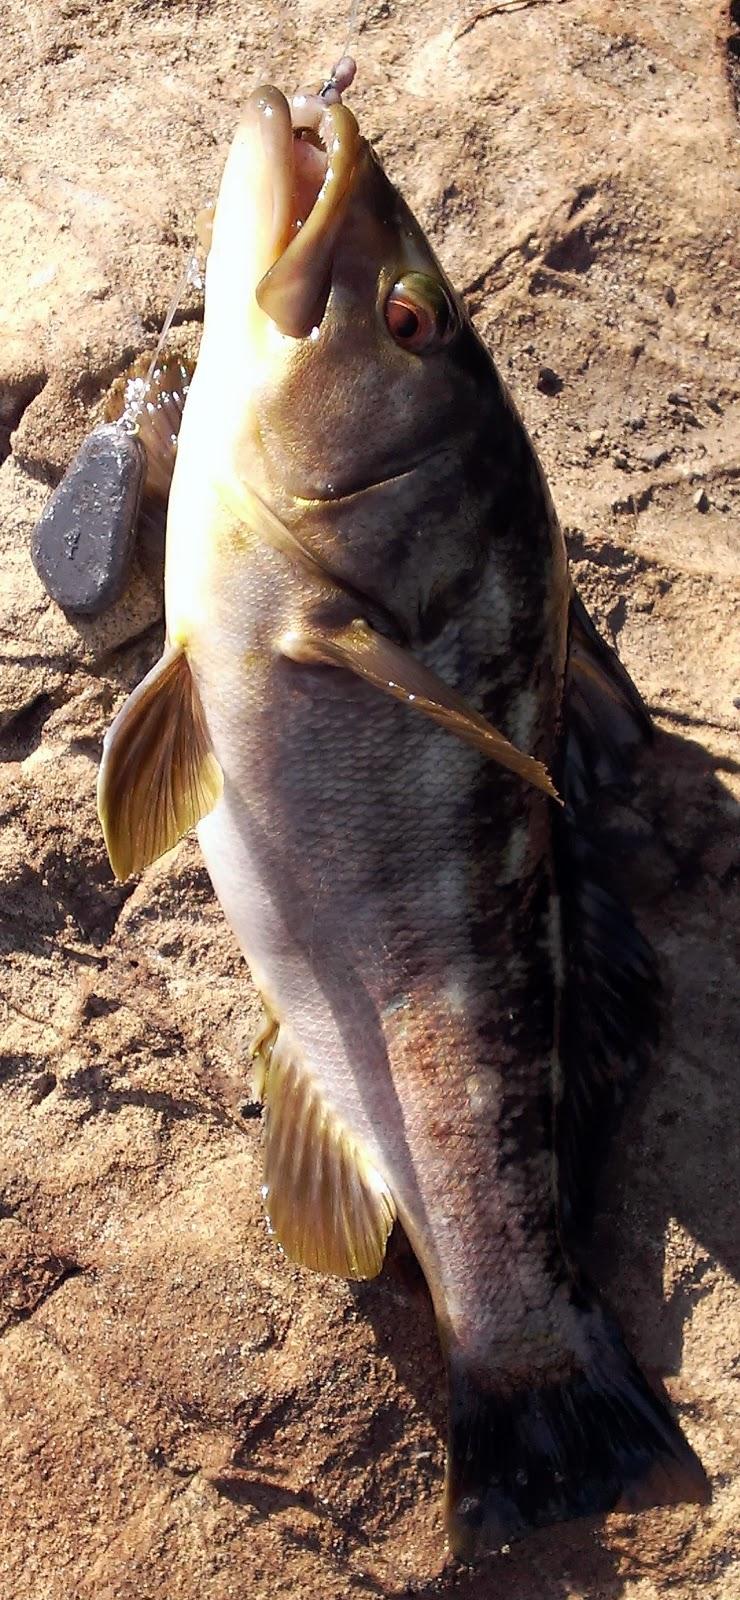 Burger 39 s fishing log surf fishing malibu 08 02 2013 for Calico bass fishing